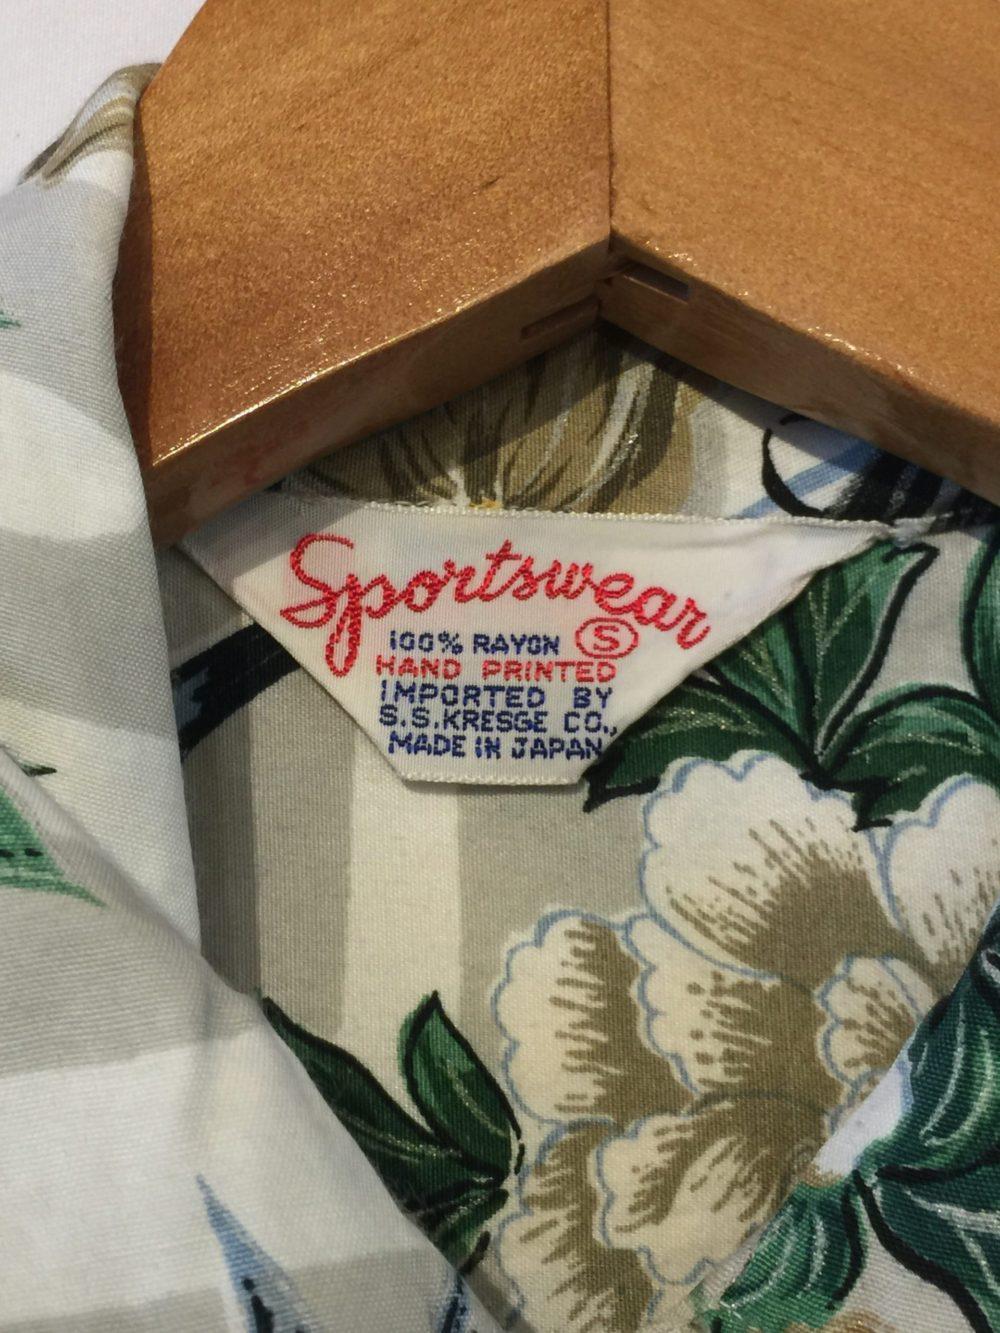 1950's Sportswear S.S KRESGE Co. ビンテージレーヨンアロハシャツ